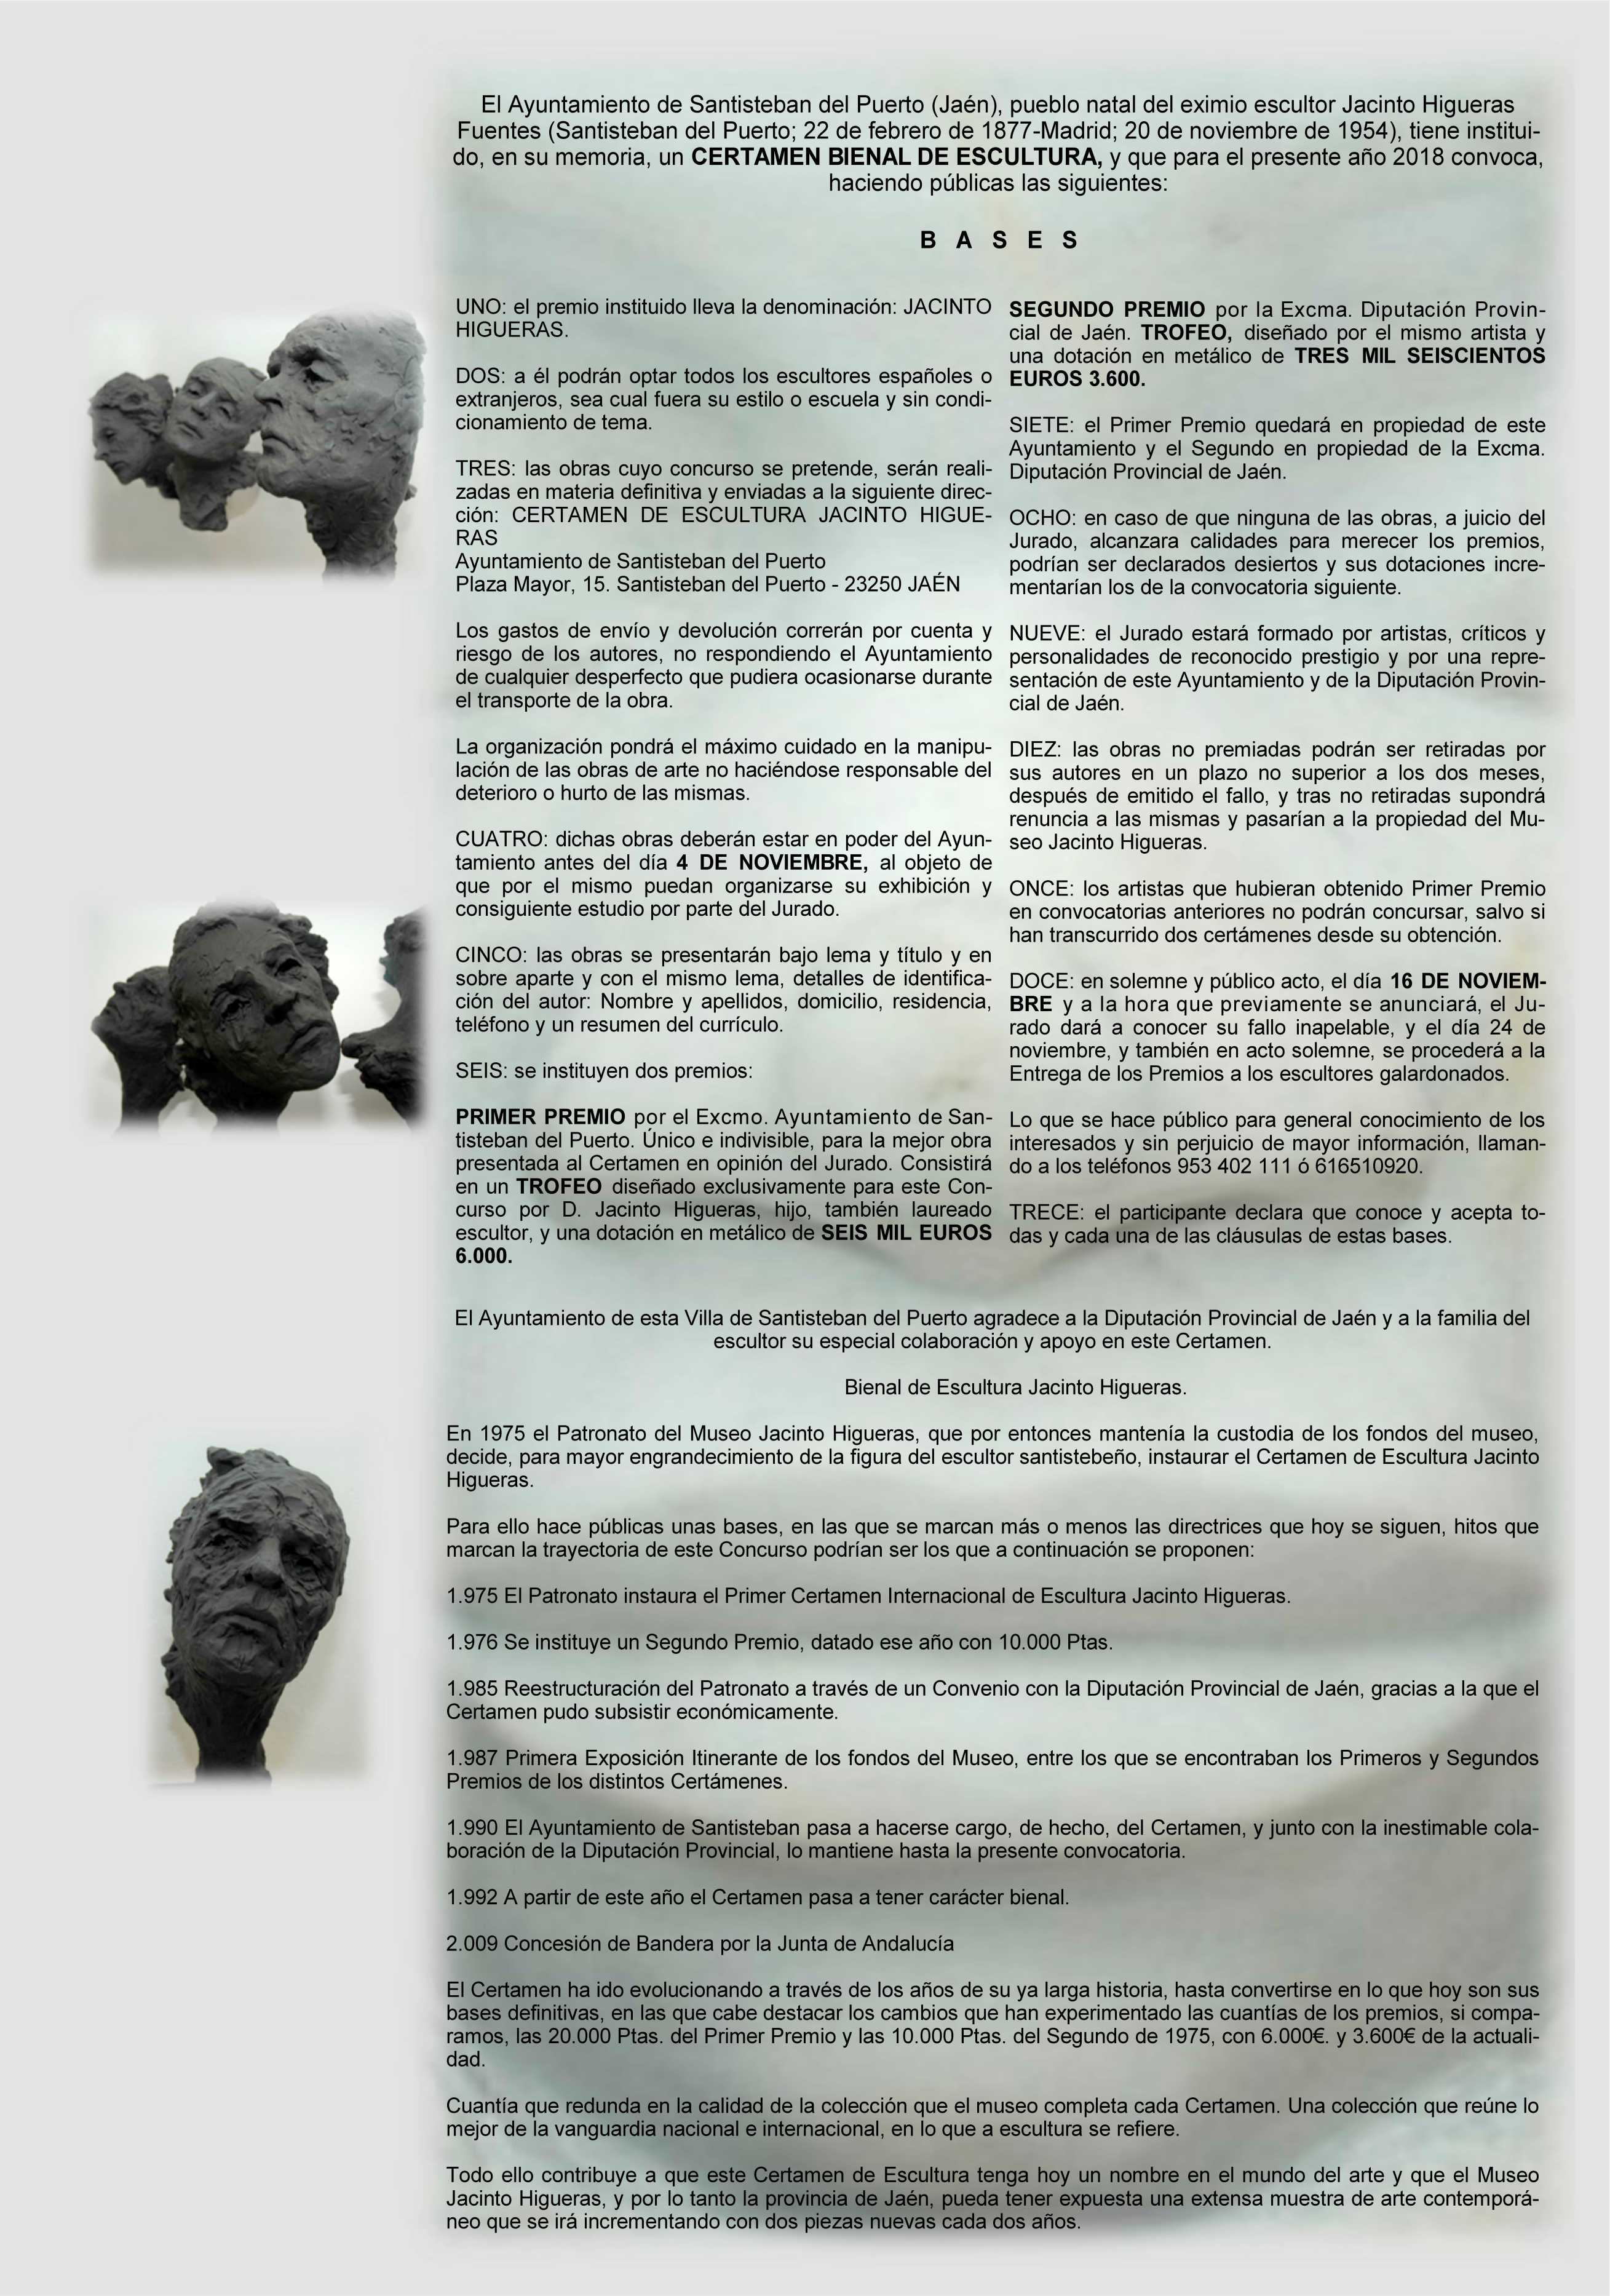 Bases 30 Bienal Escultura Jacinto Higueras